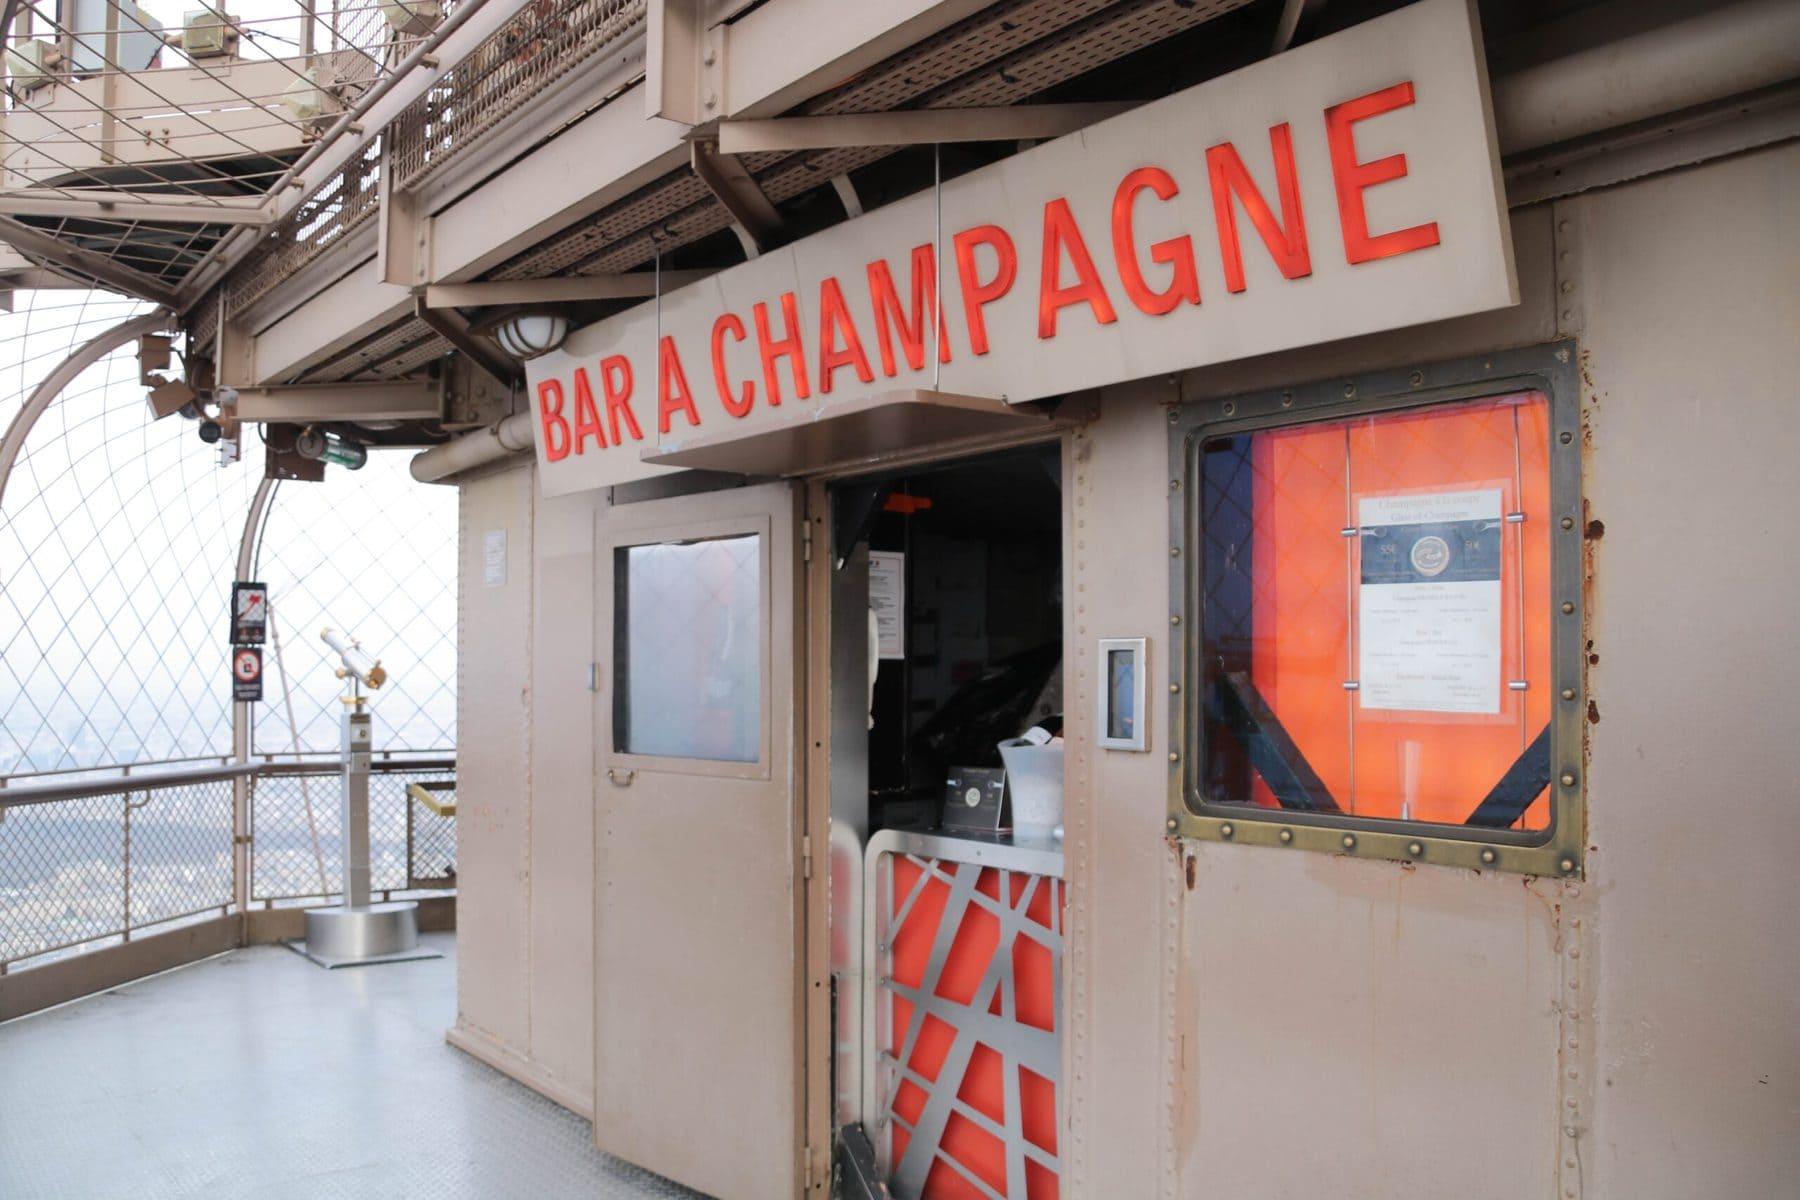 Champagnerbar, Eiffelturm, Paris